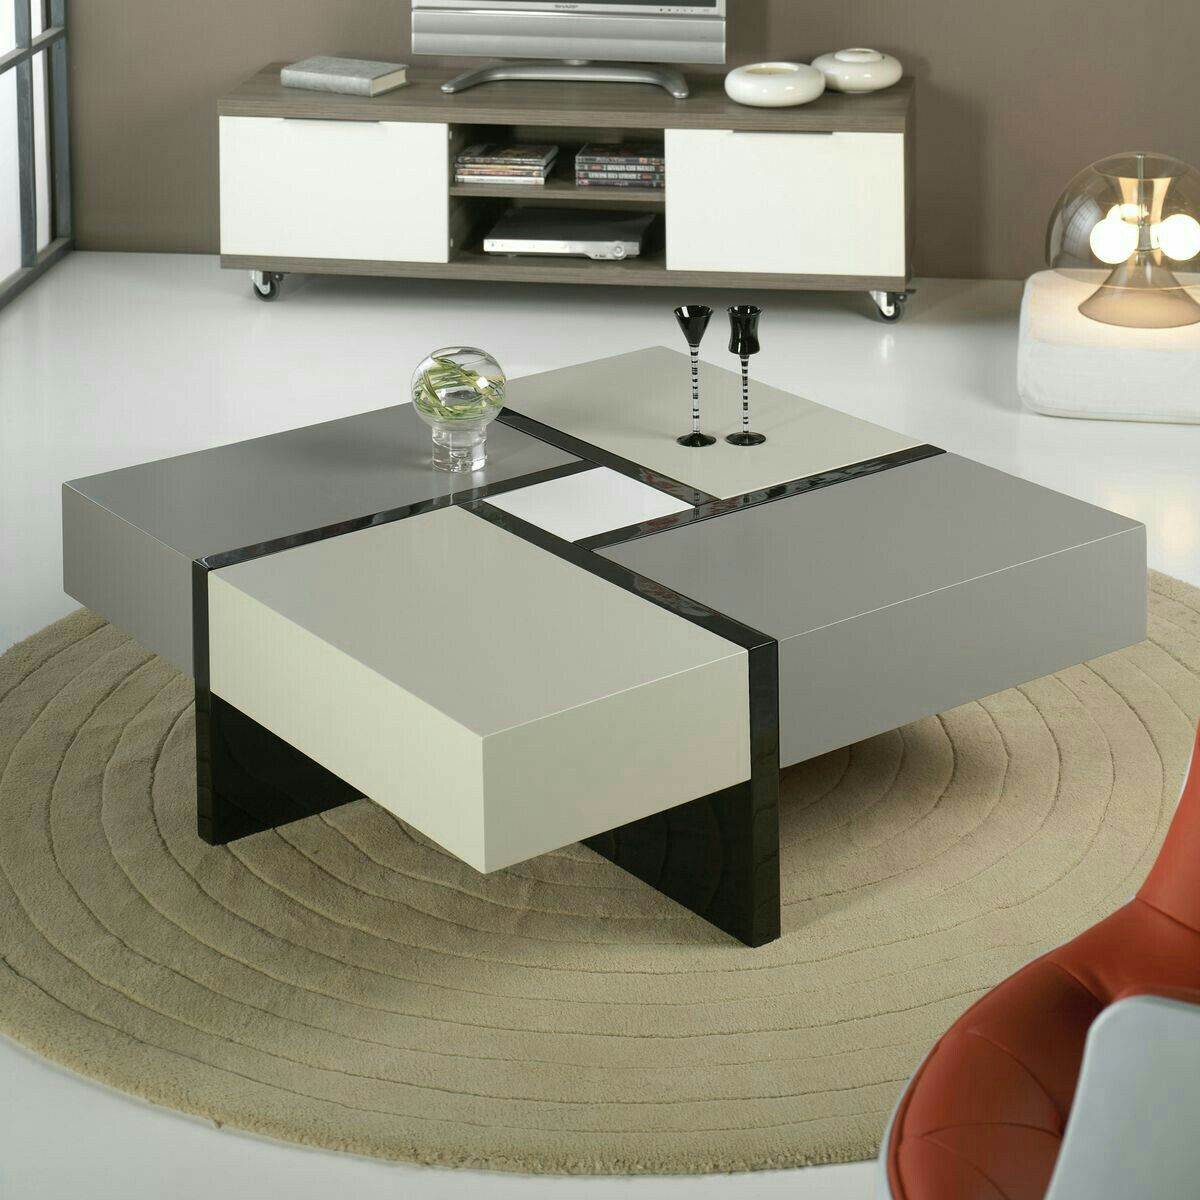 Pin by Imran Malik on Tables | Coffee table design, Modern ...